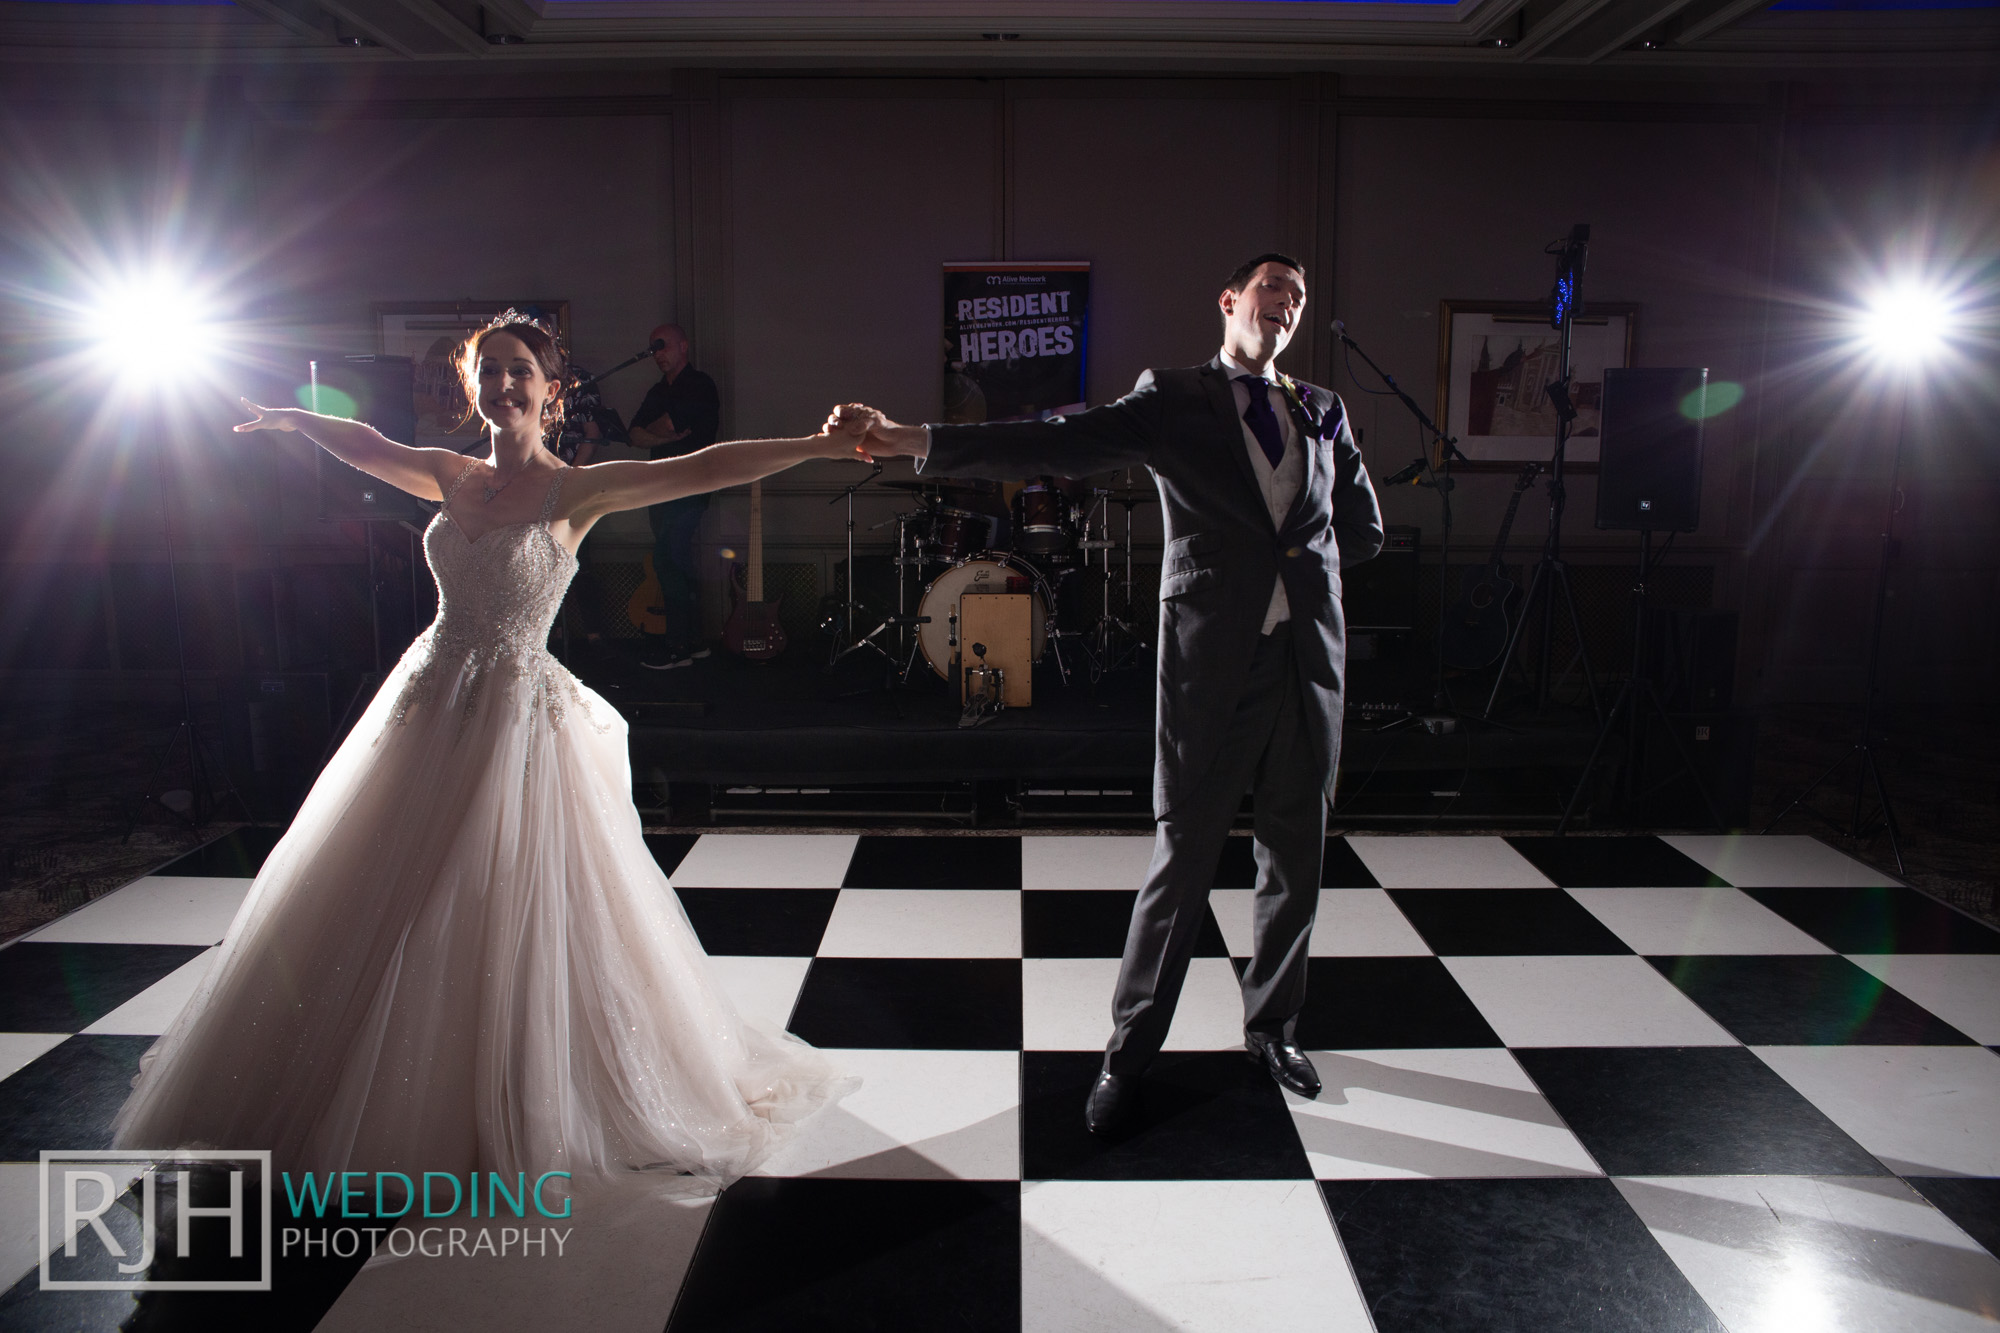 Oulton Hall Wedding Photography_Goodwill-Hall_054_IMG_6985.jpg